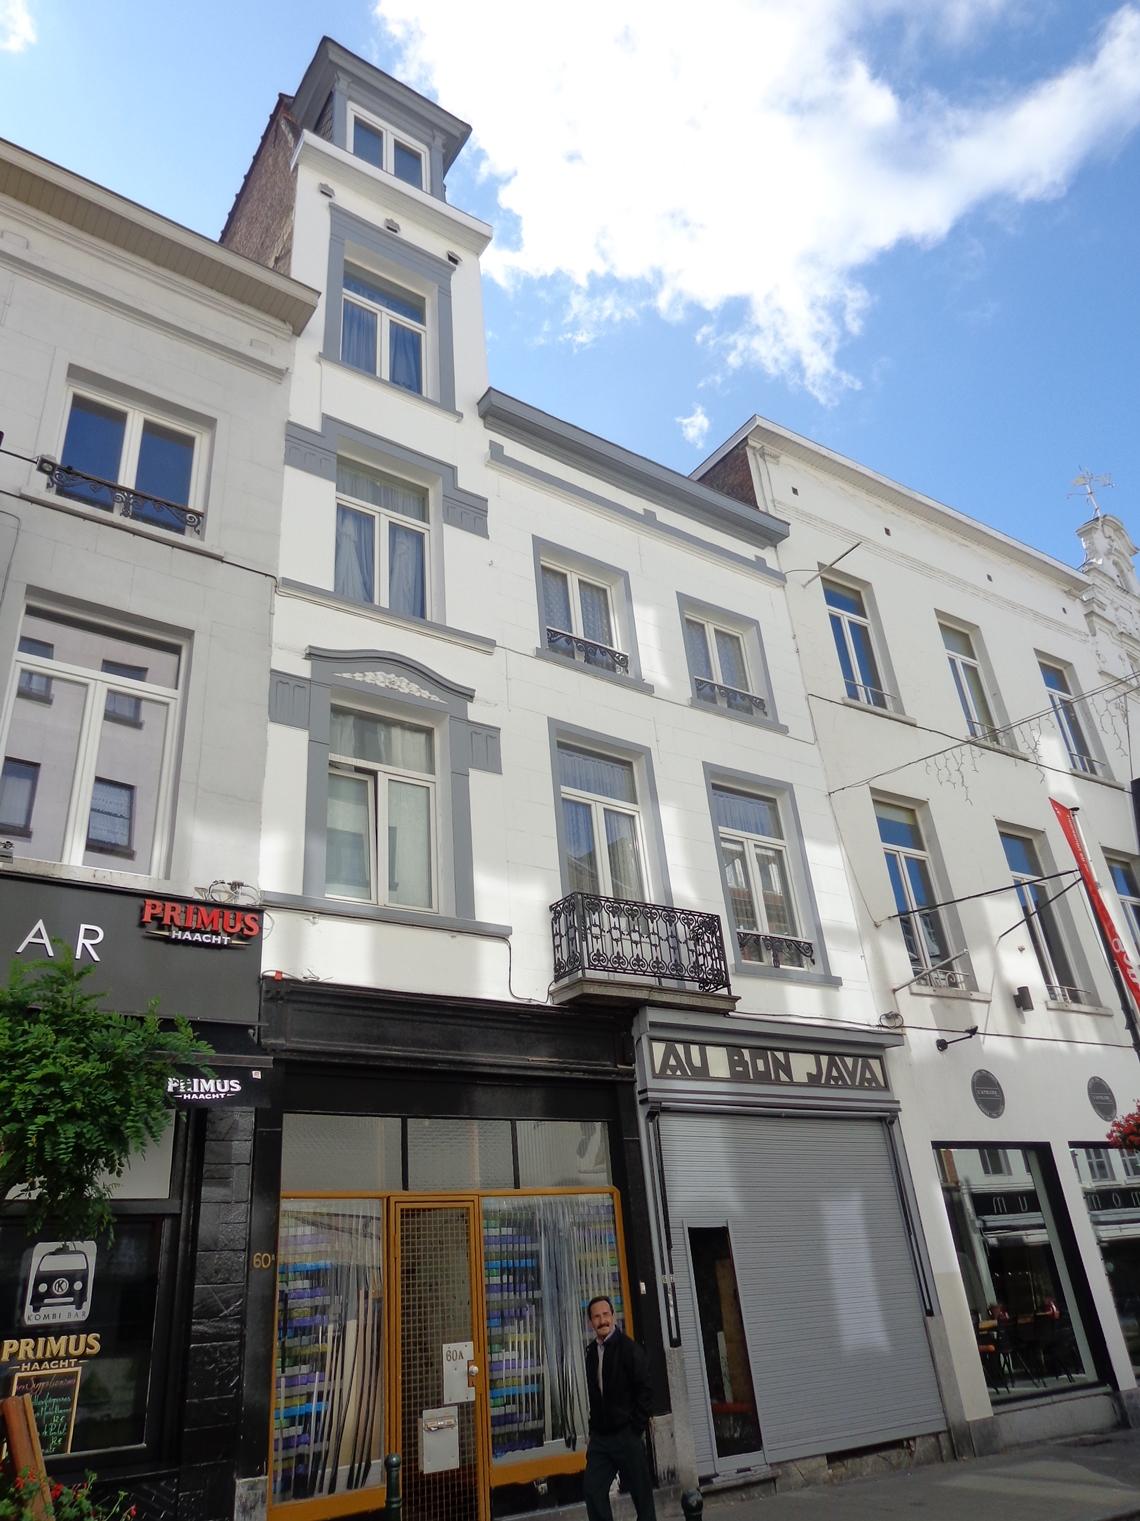 Bruxelles Pentagone Rue Haute 60 60a 62